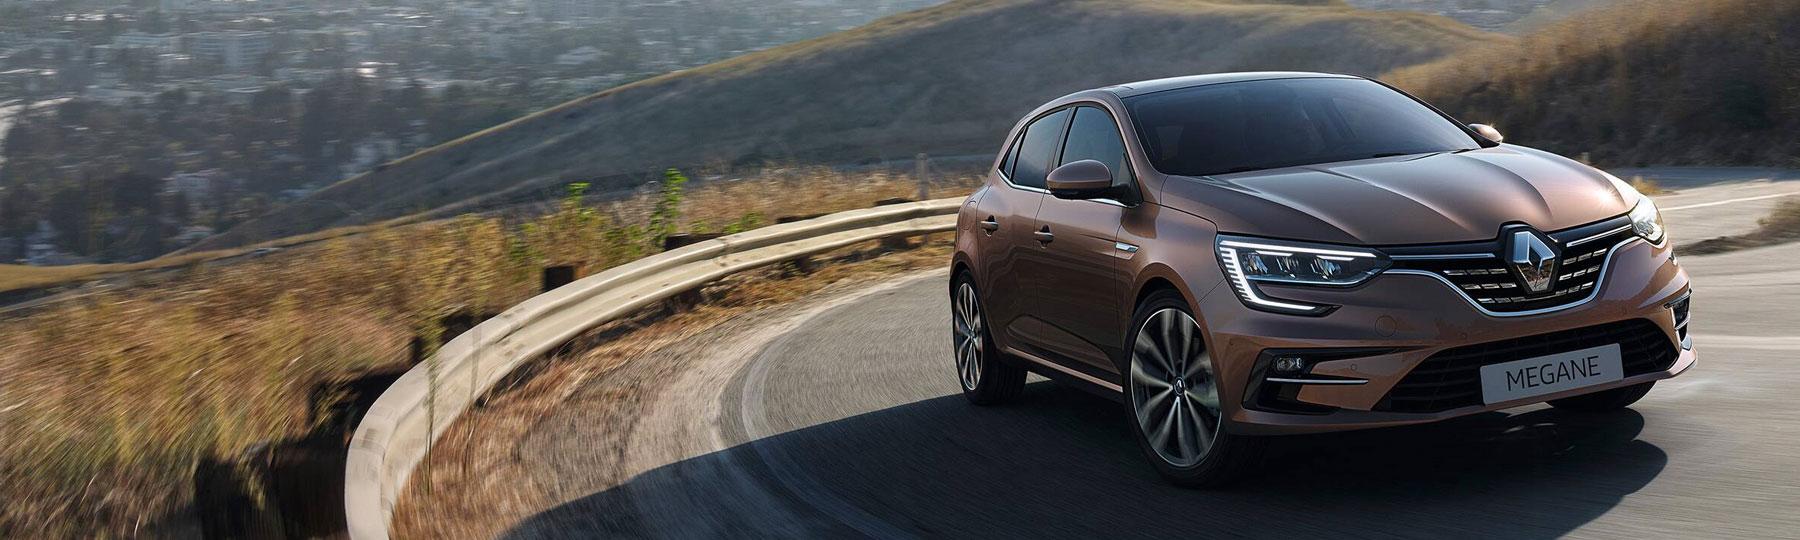 New Renault MEGANE New Car Offer